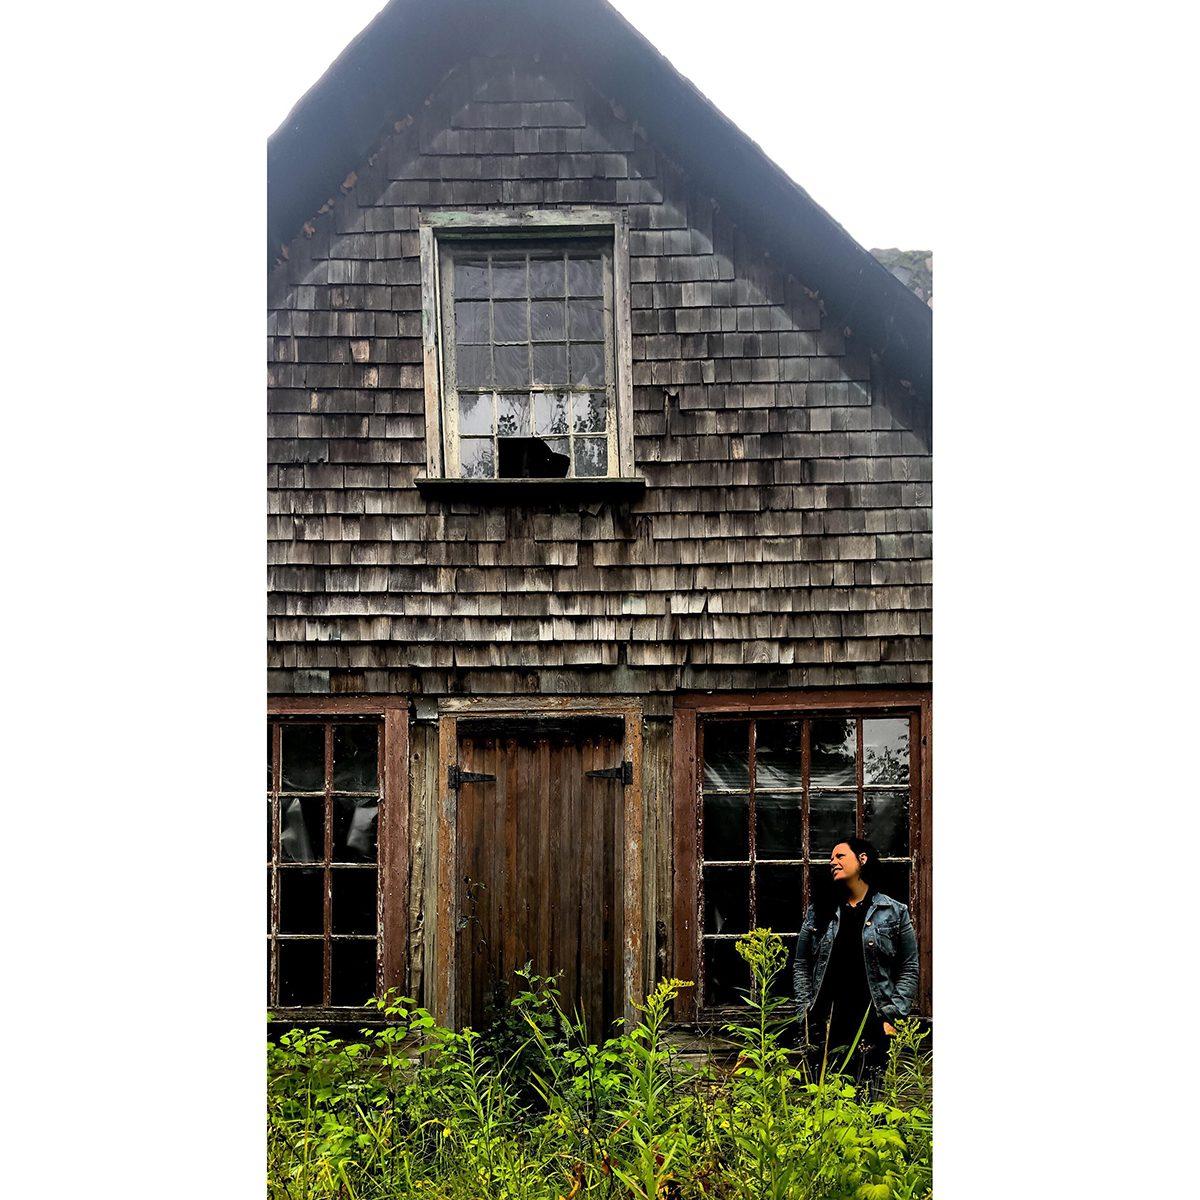 Canadian history - Hudson's Bay trading post